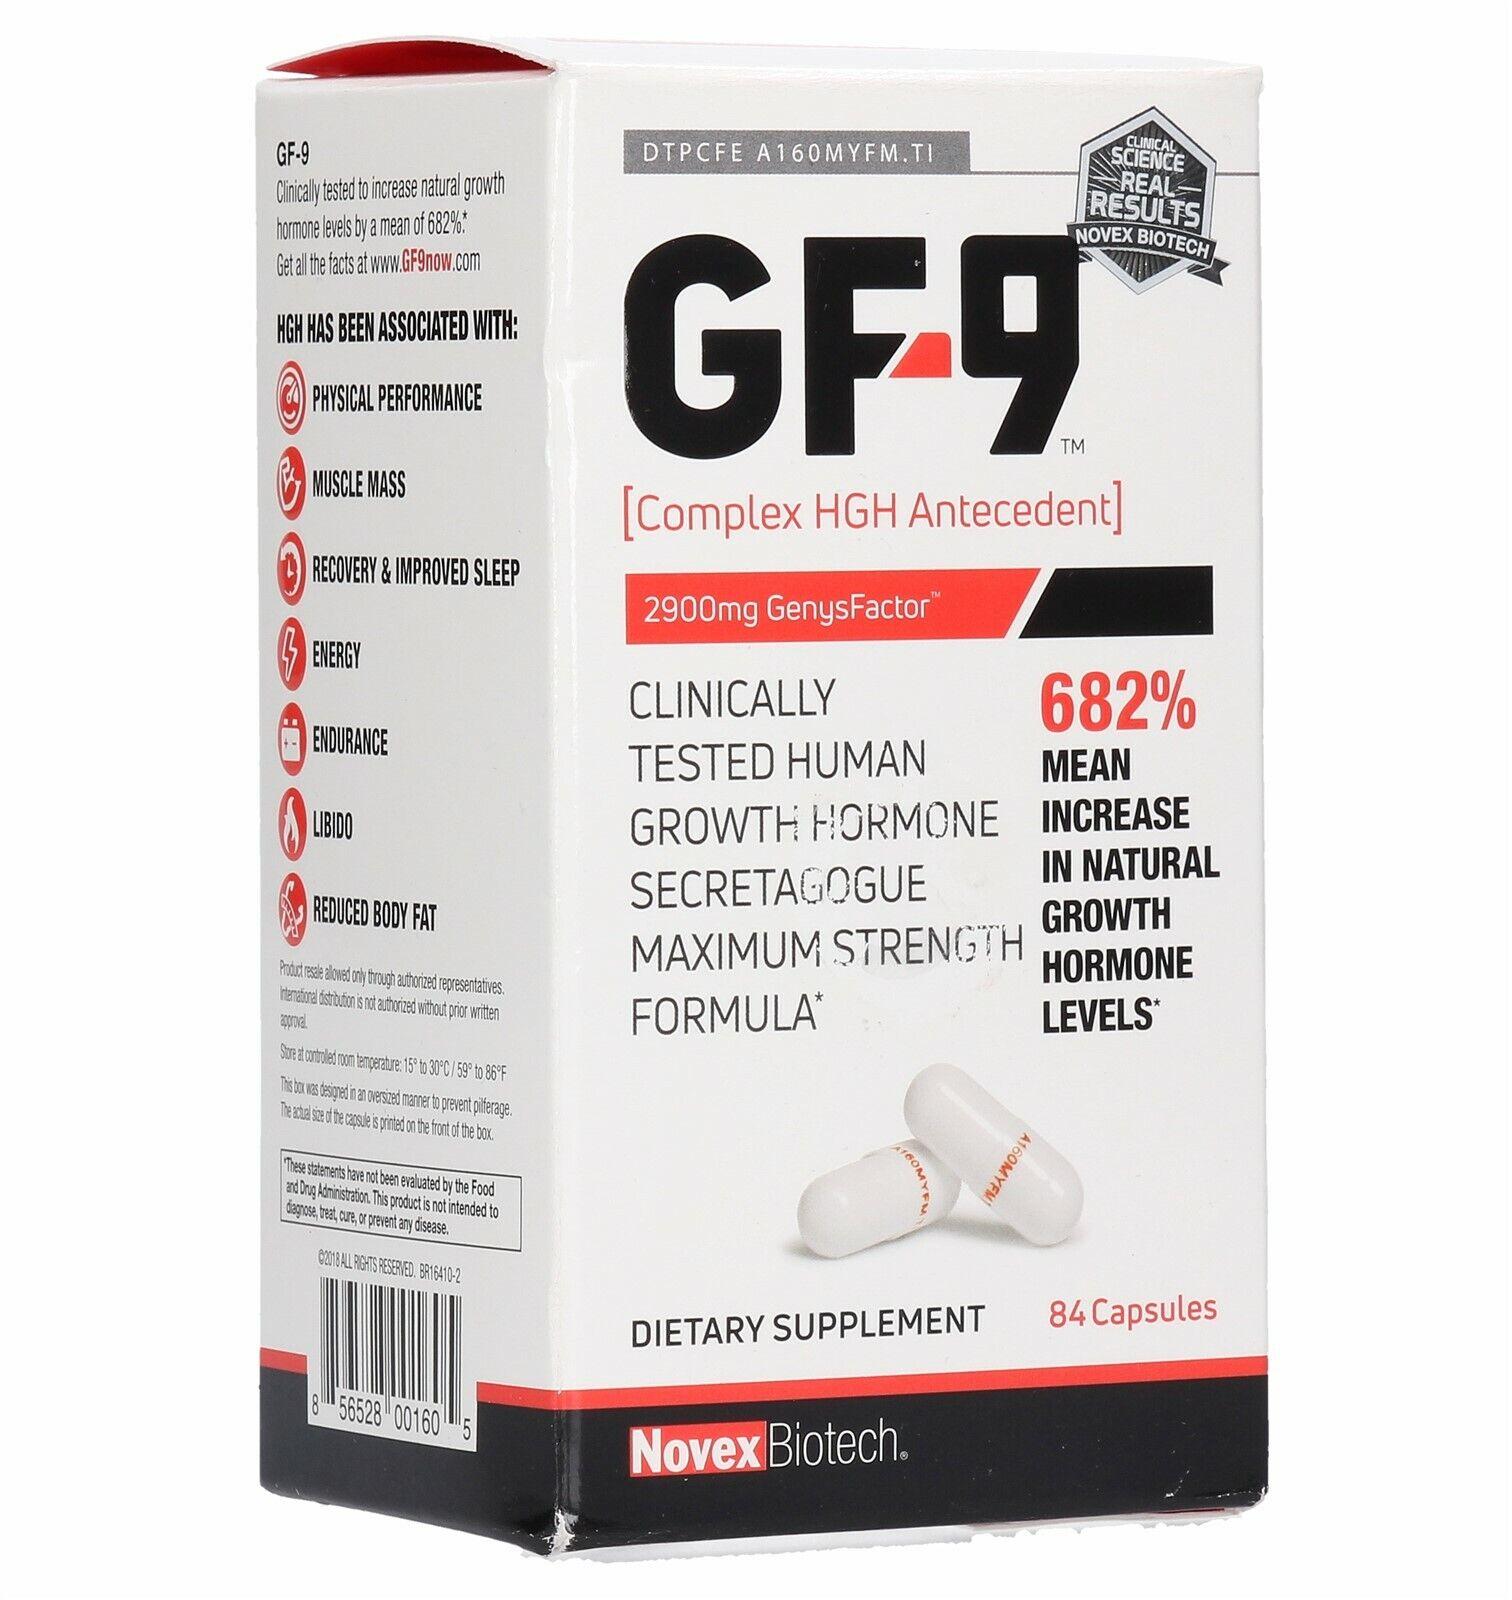 Novex Biotech GF-9, 84 Count